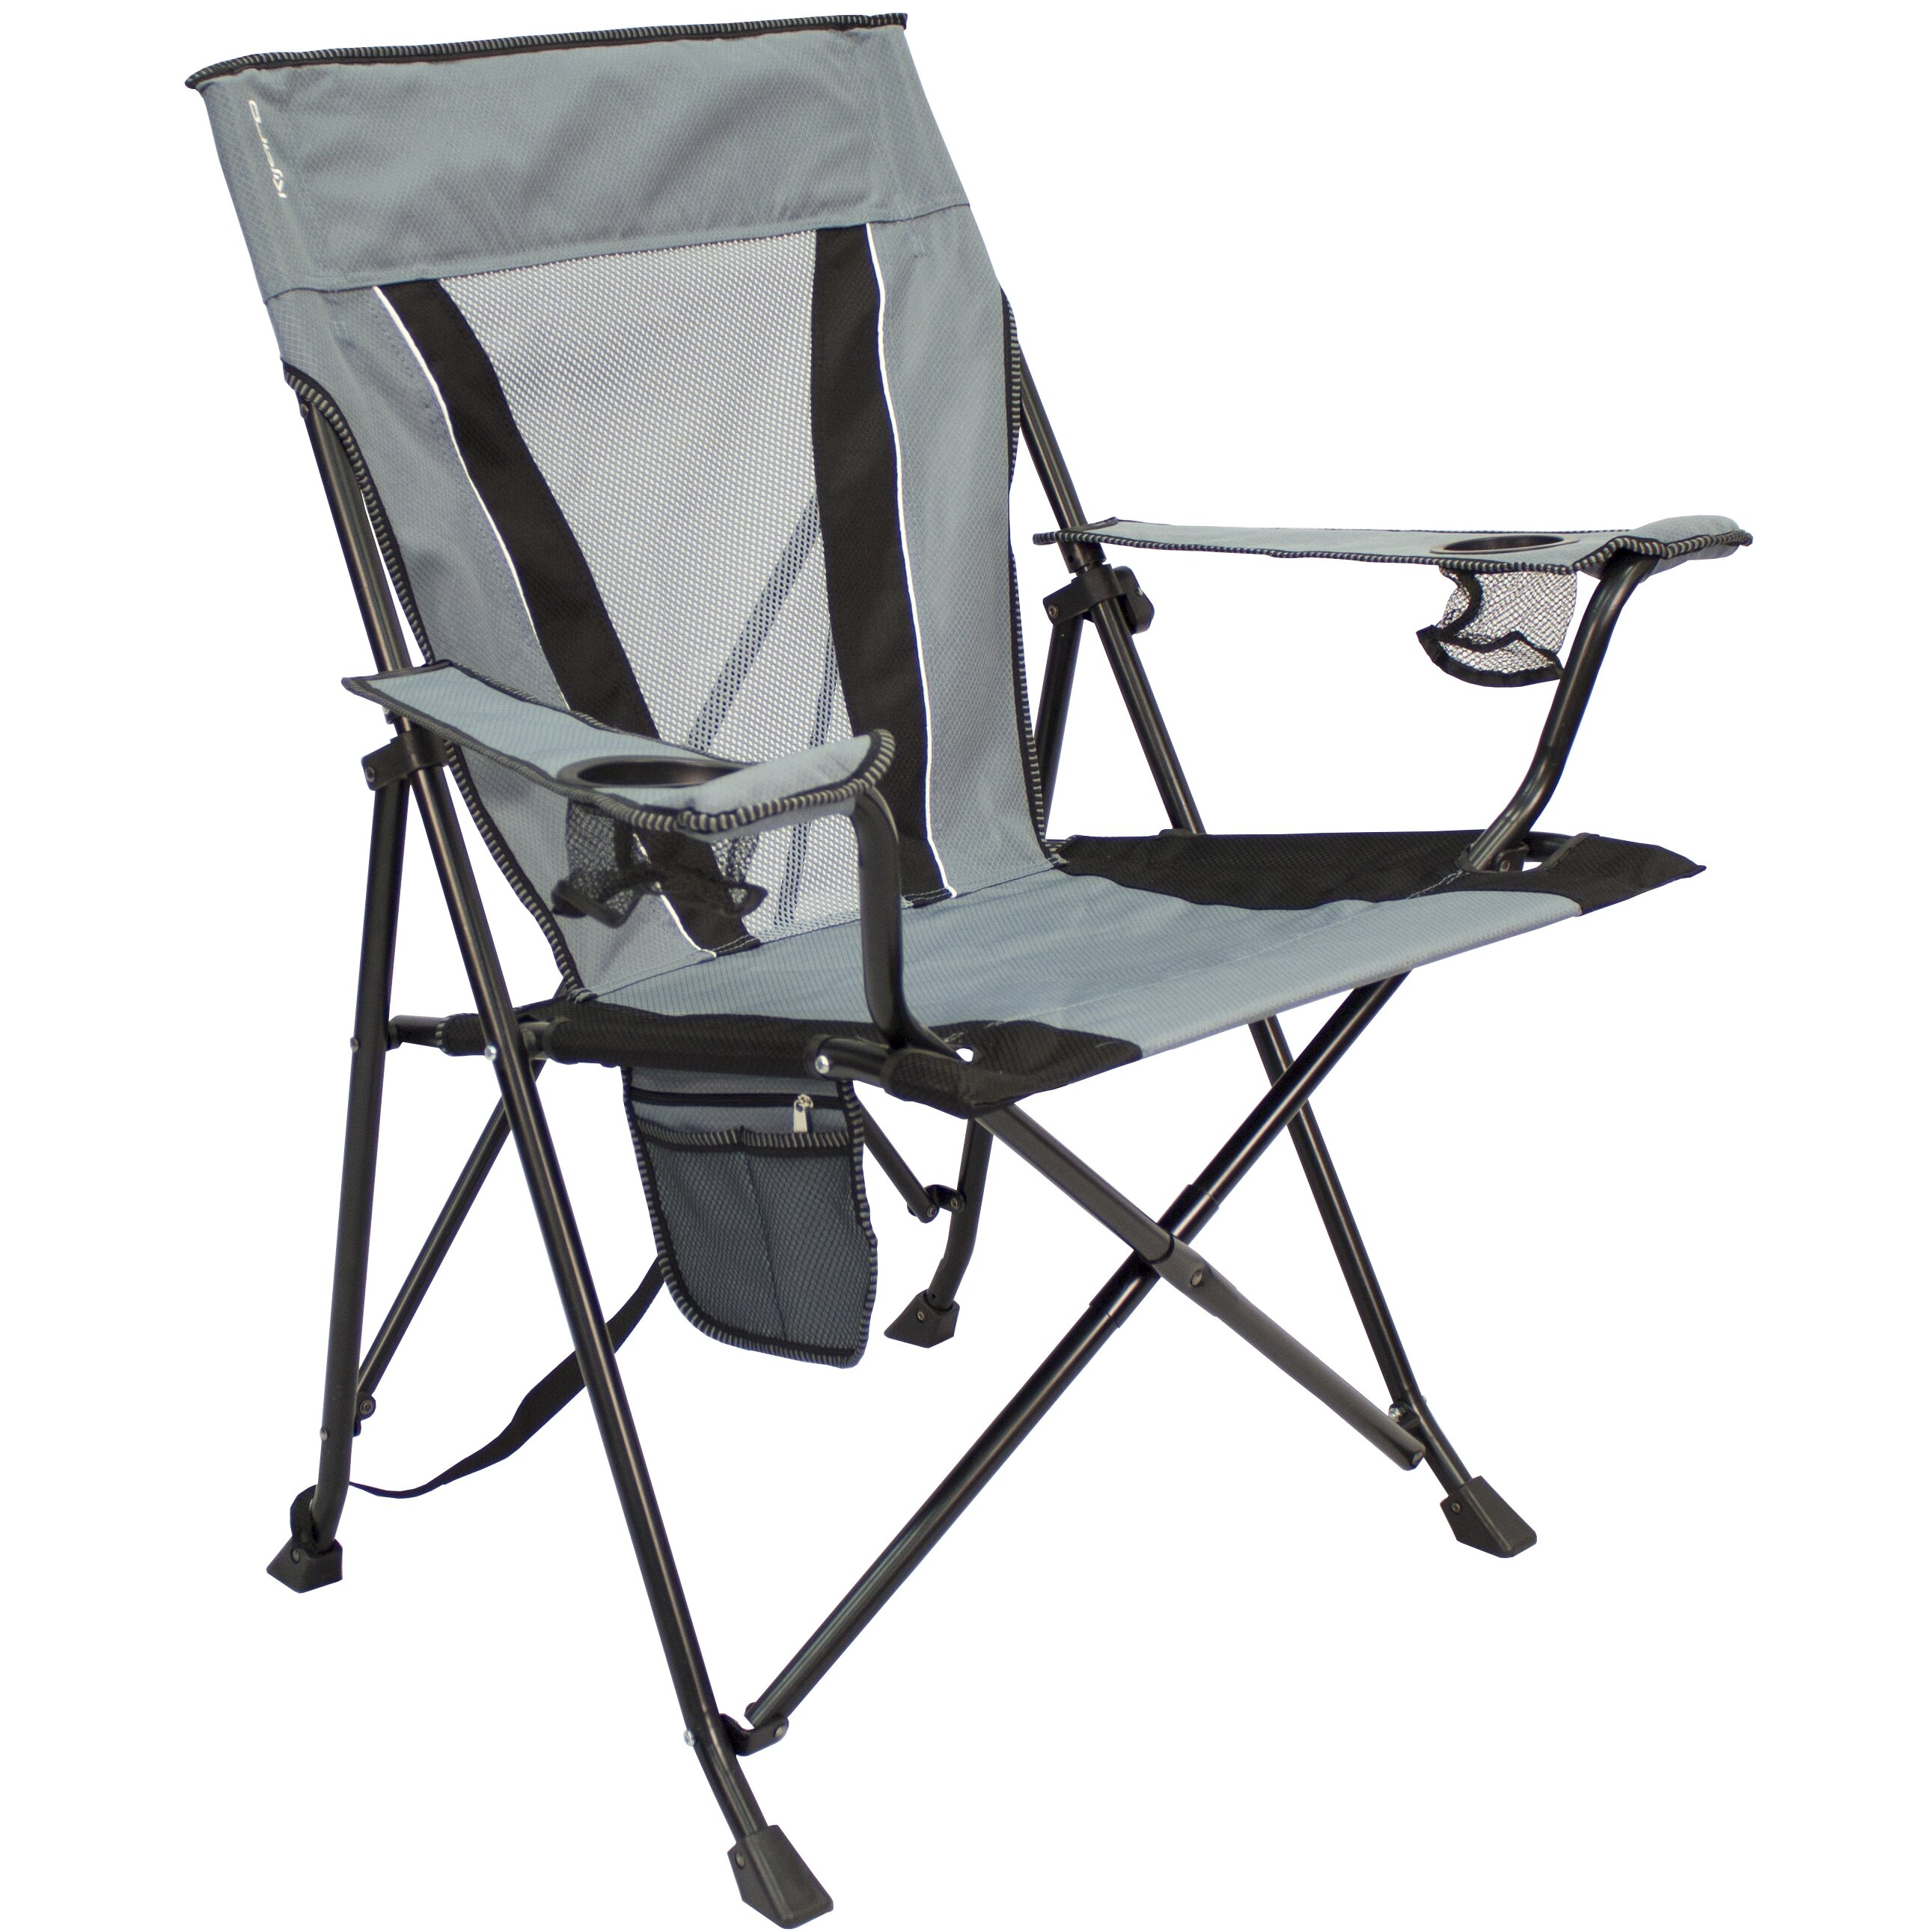 Kijaro Dual Lock Chair Wayfair